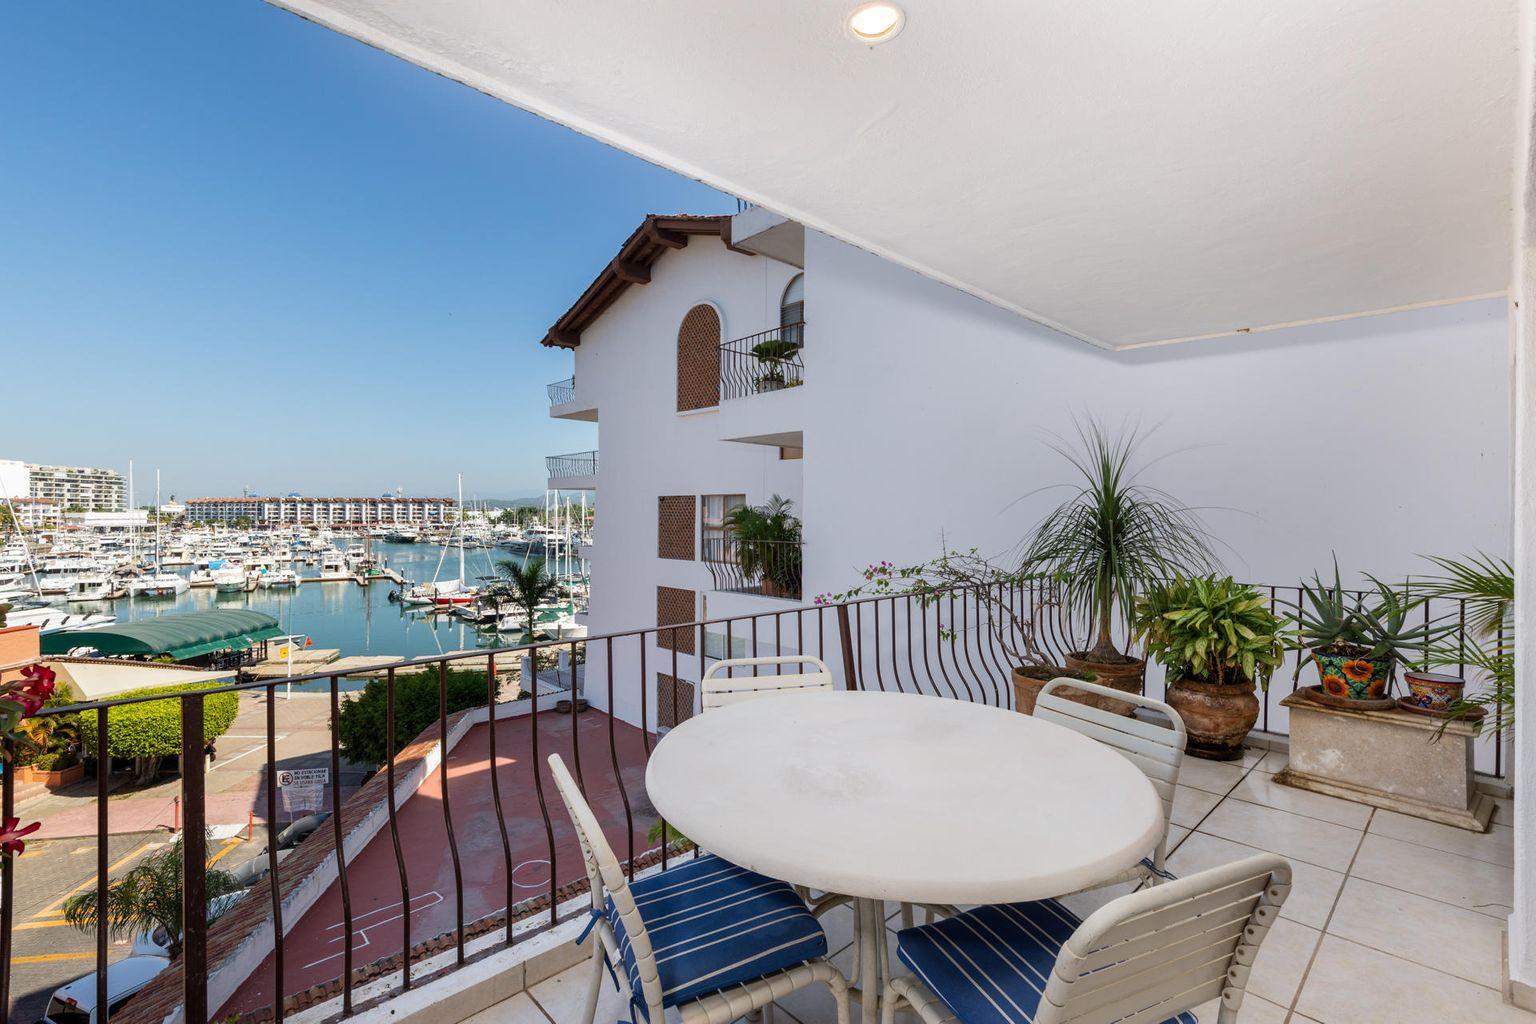 $299,000 for this 2 bedroom Marina condo